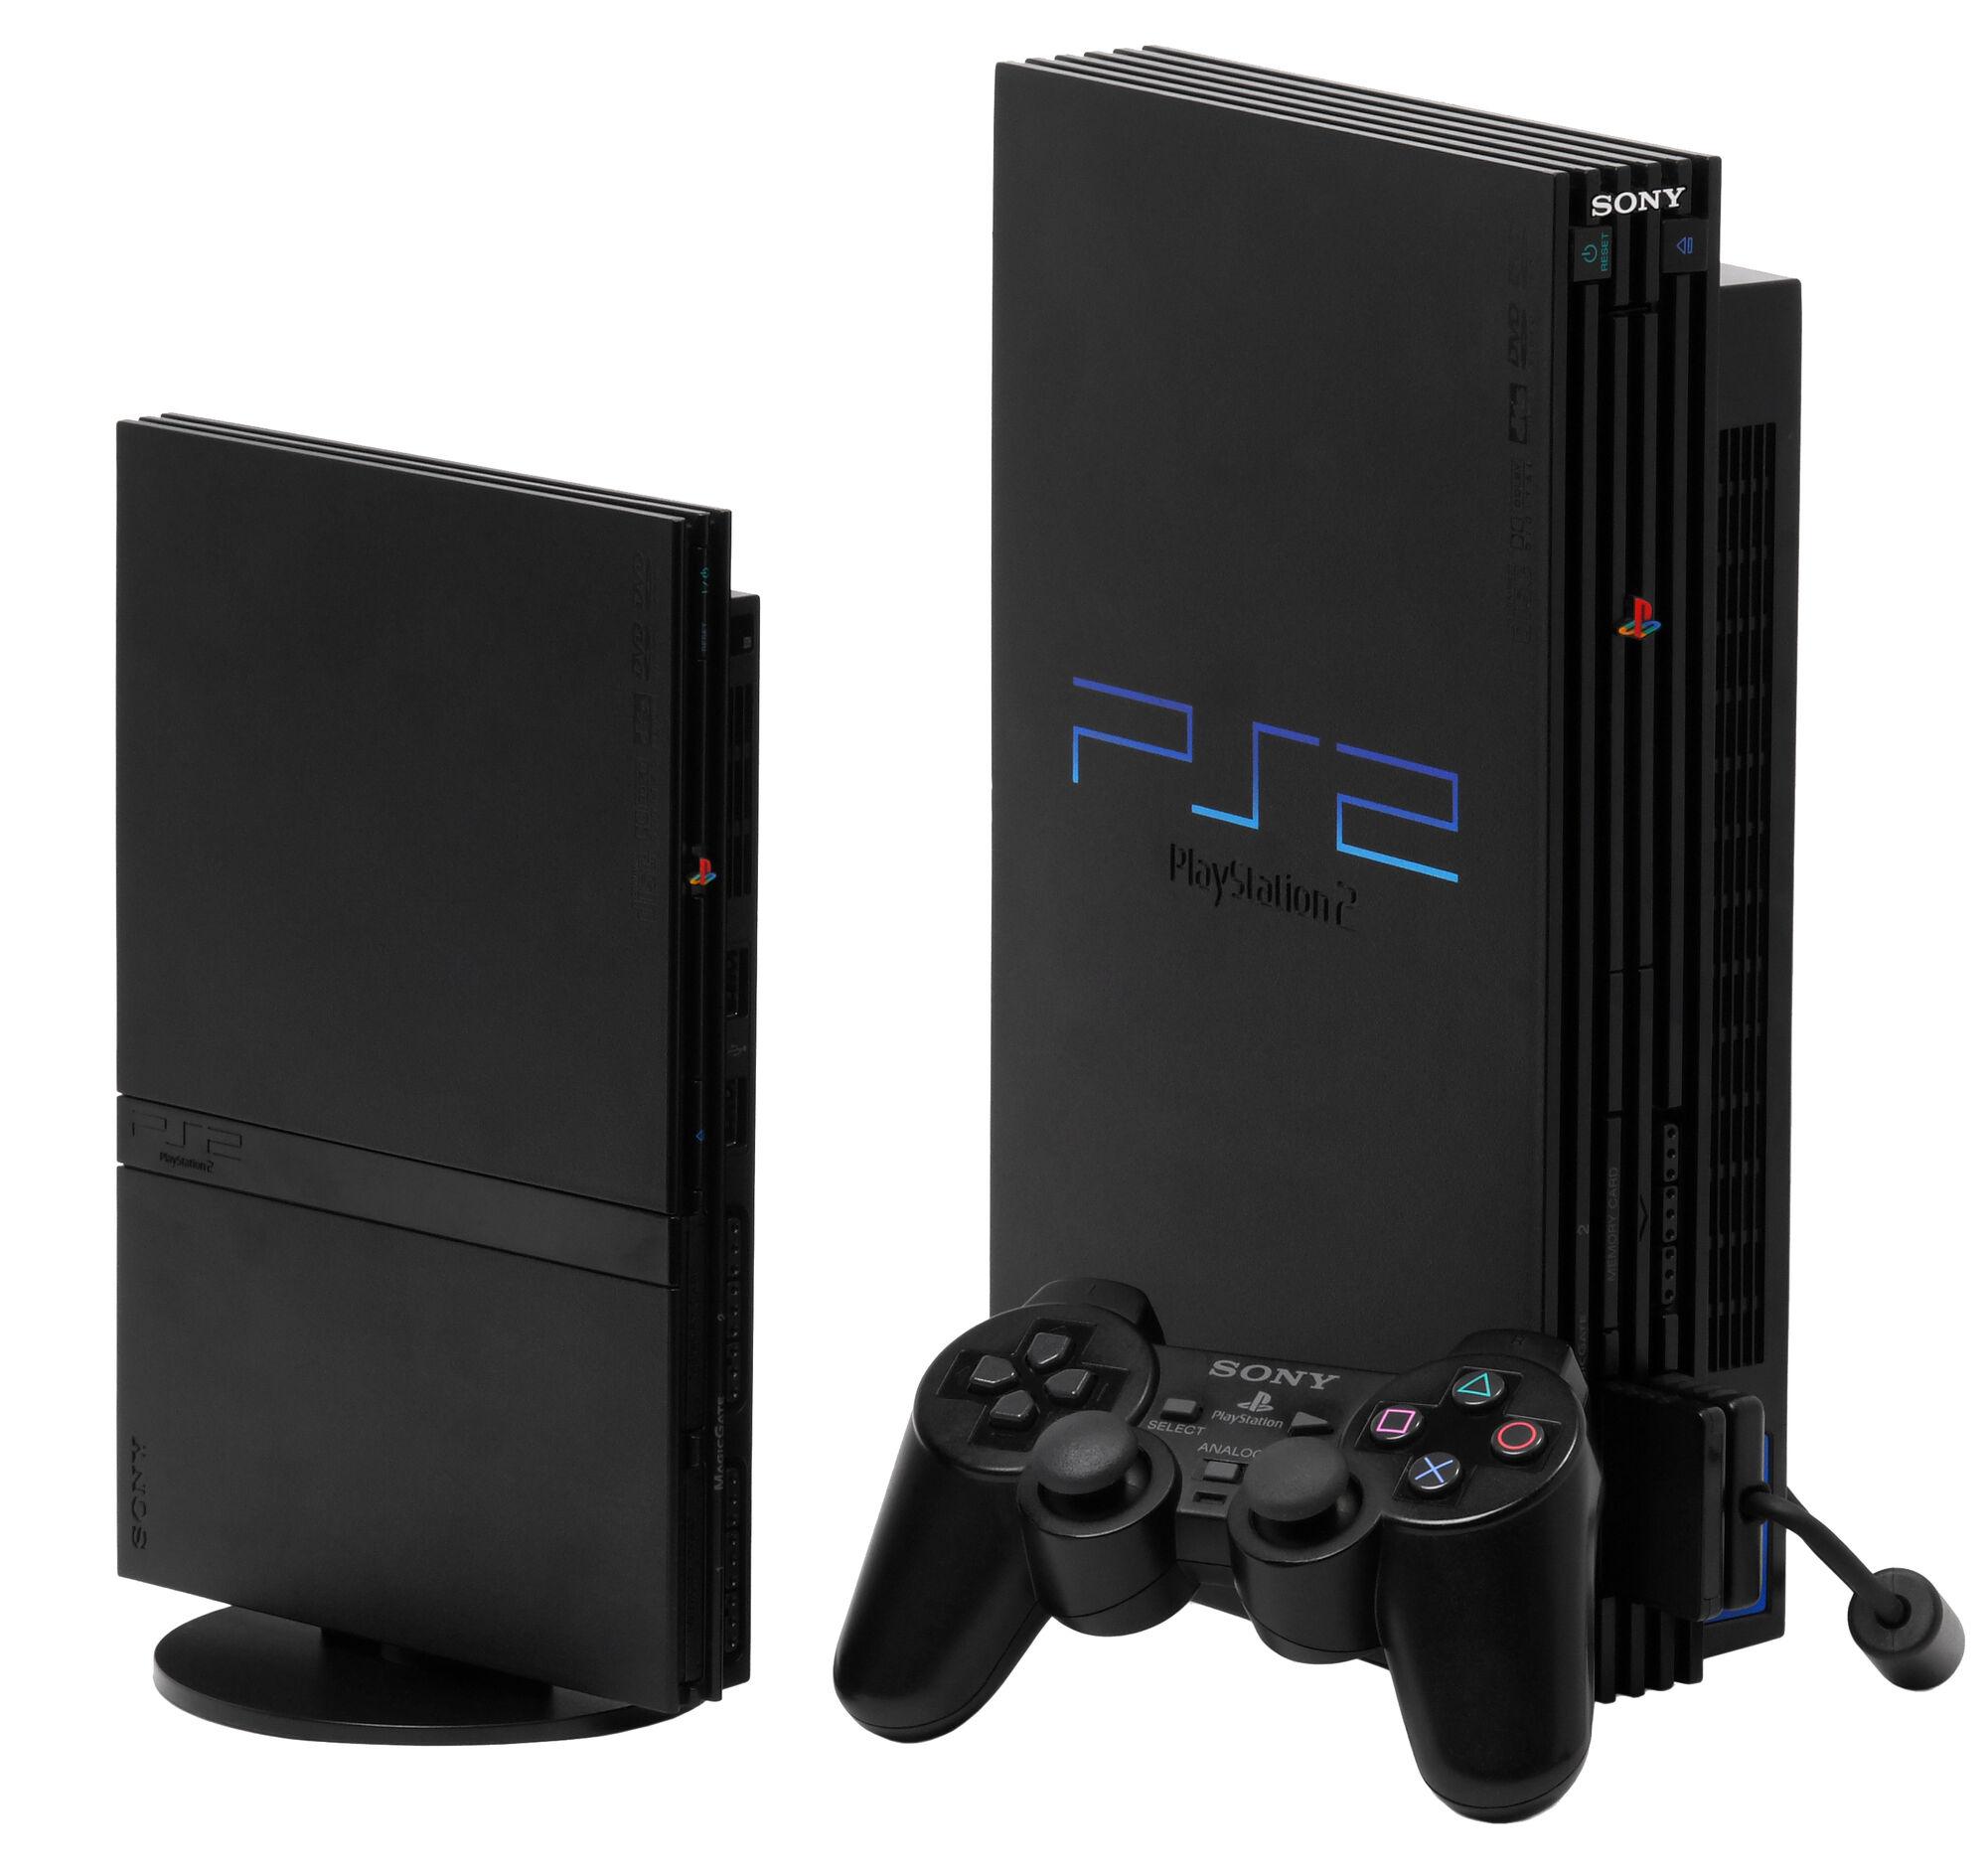 PlayStation 2 | PlayStation Wiki | FANDOM powered by Wikia